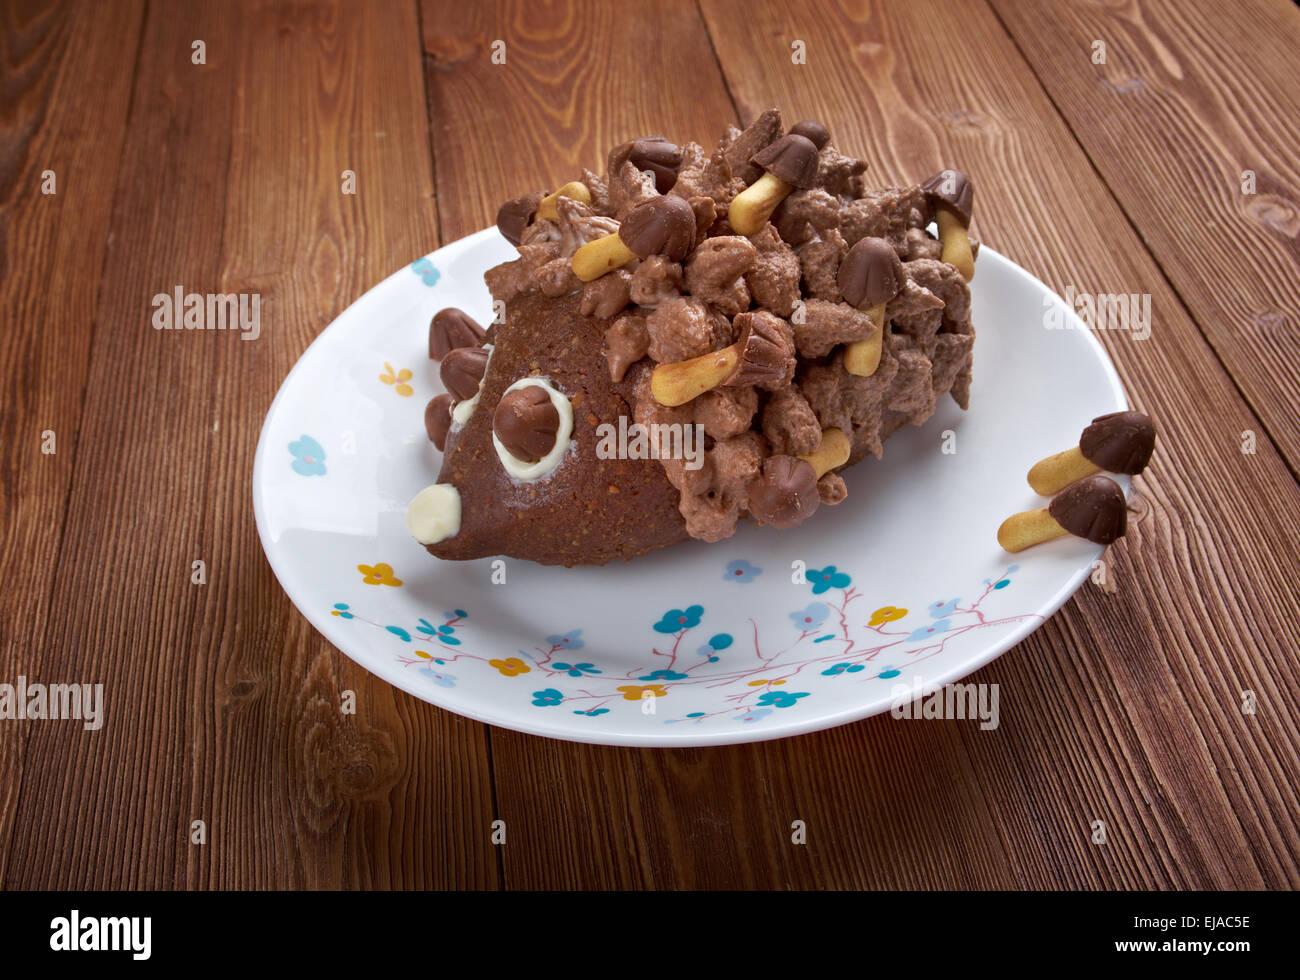 Kinder Schokoladen Kuchen Igel Stockfoto Bild 80134362 Alamy